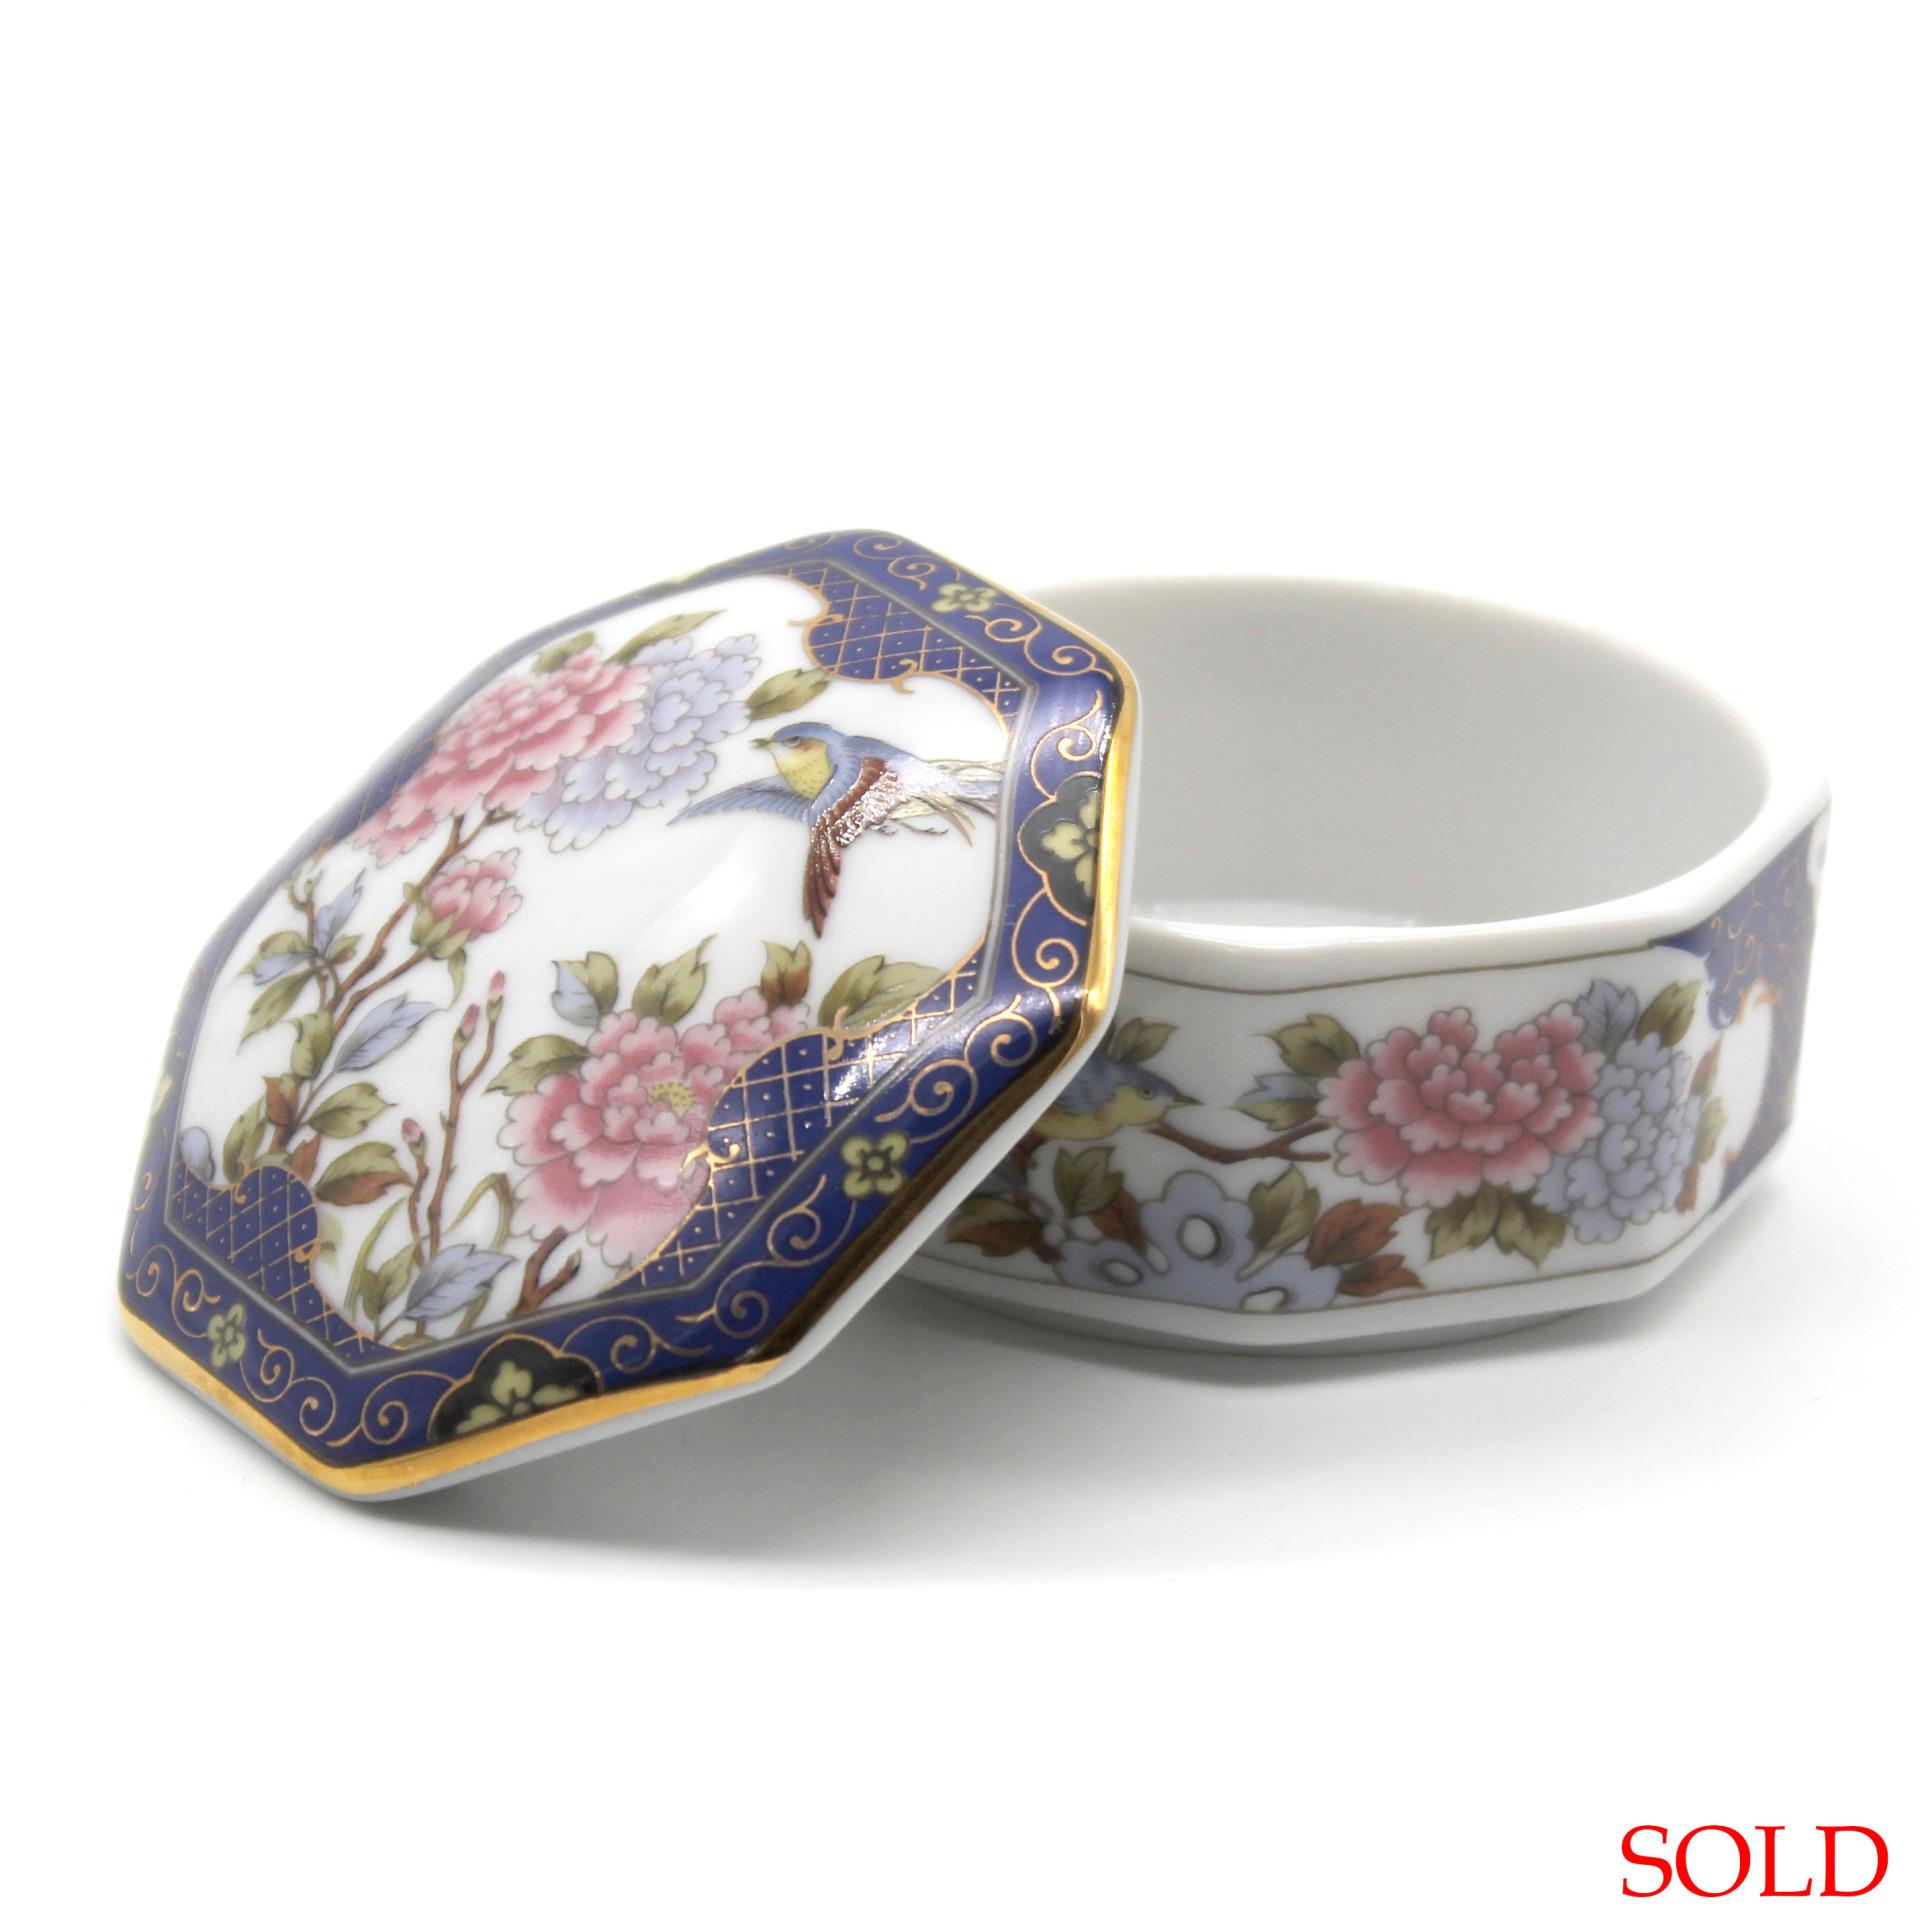 SOLD Eiwa Kinsei Japanese Porcelain Box